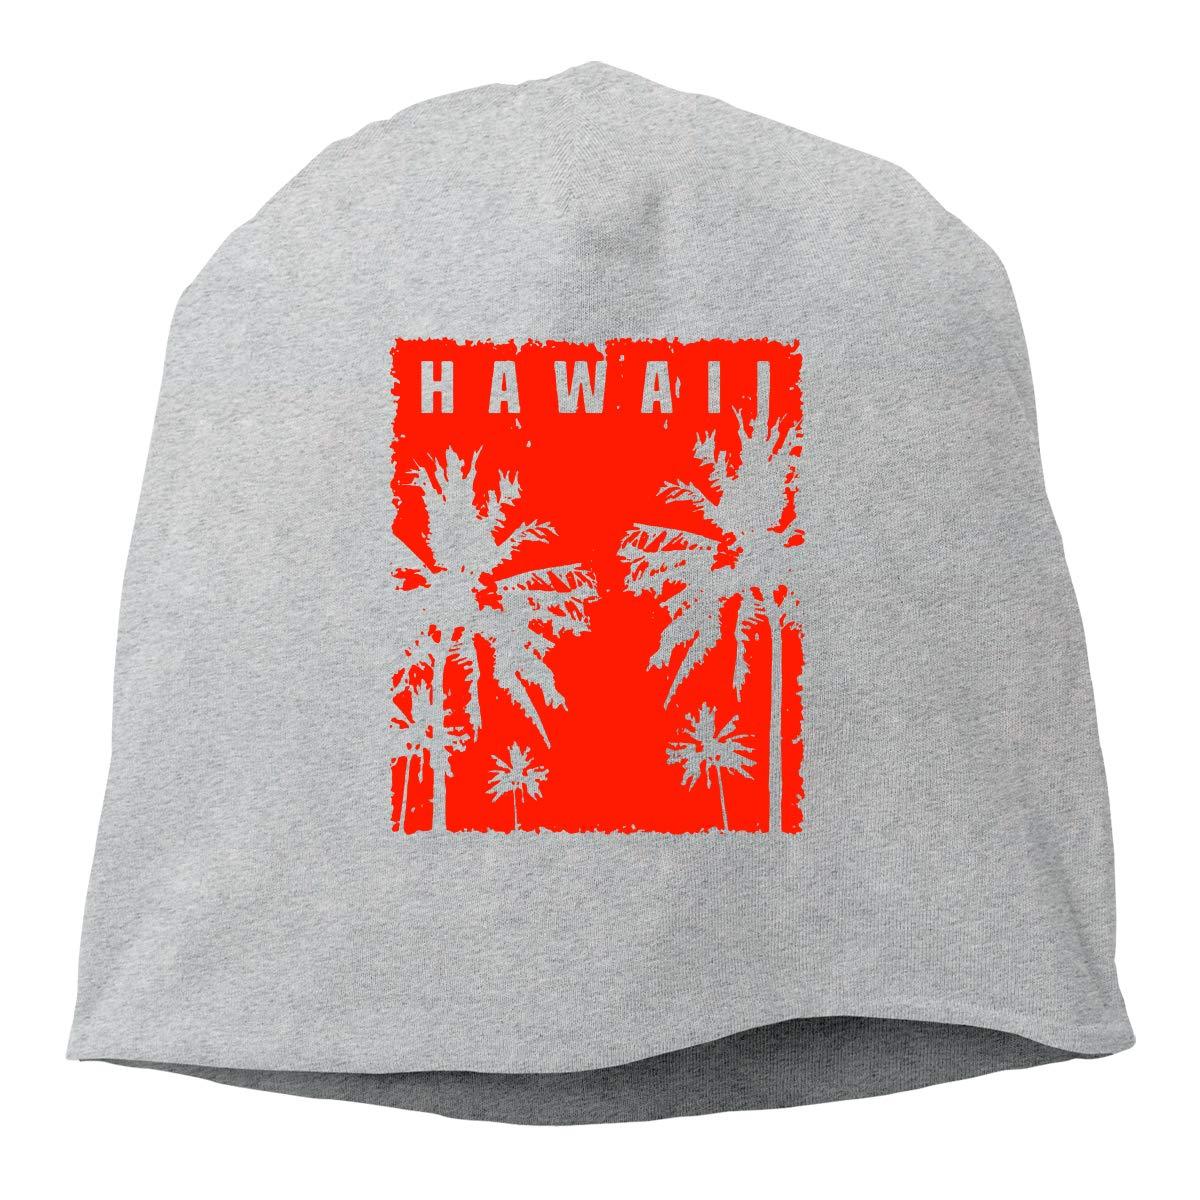 Hawaii Vintage Unisex Knitted Hat Beanie Hat Warm Hats Skull Cap